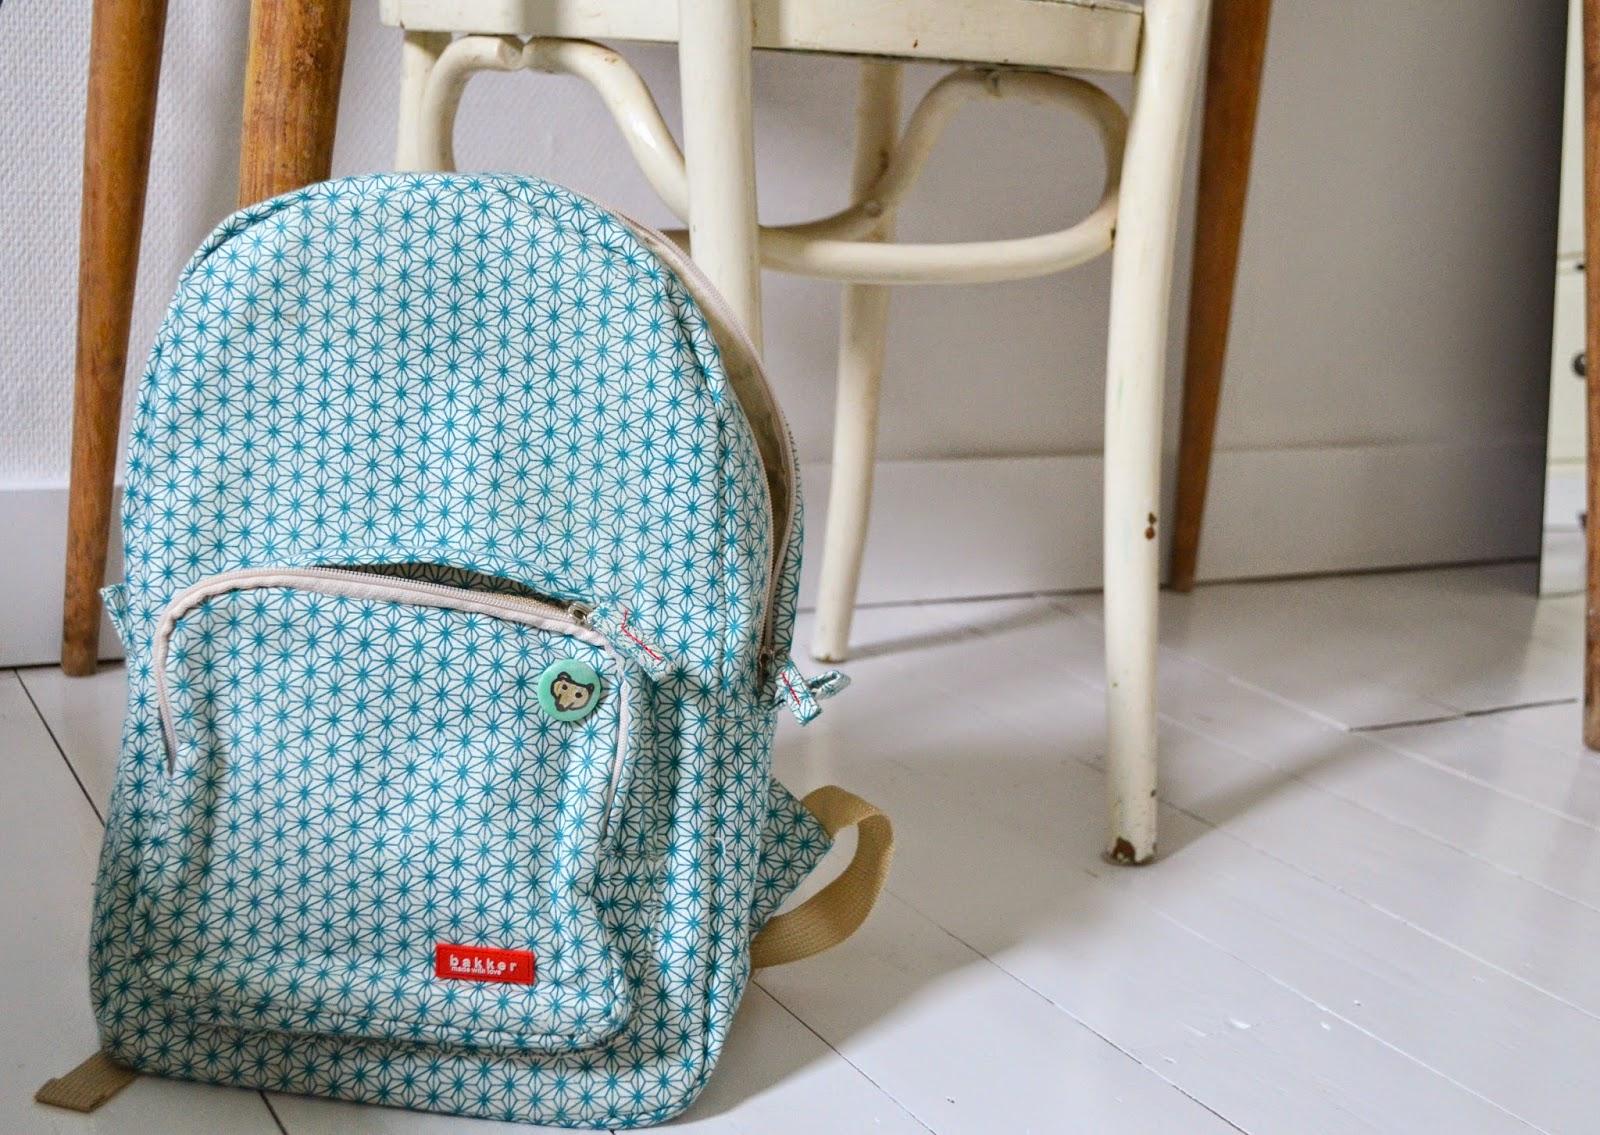 mama van vijf: Kinderkamer make-over: part 1